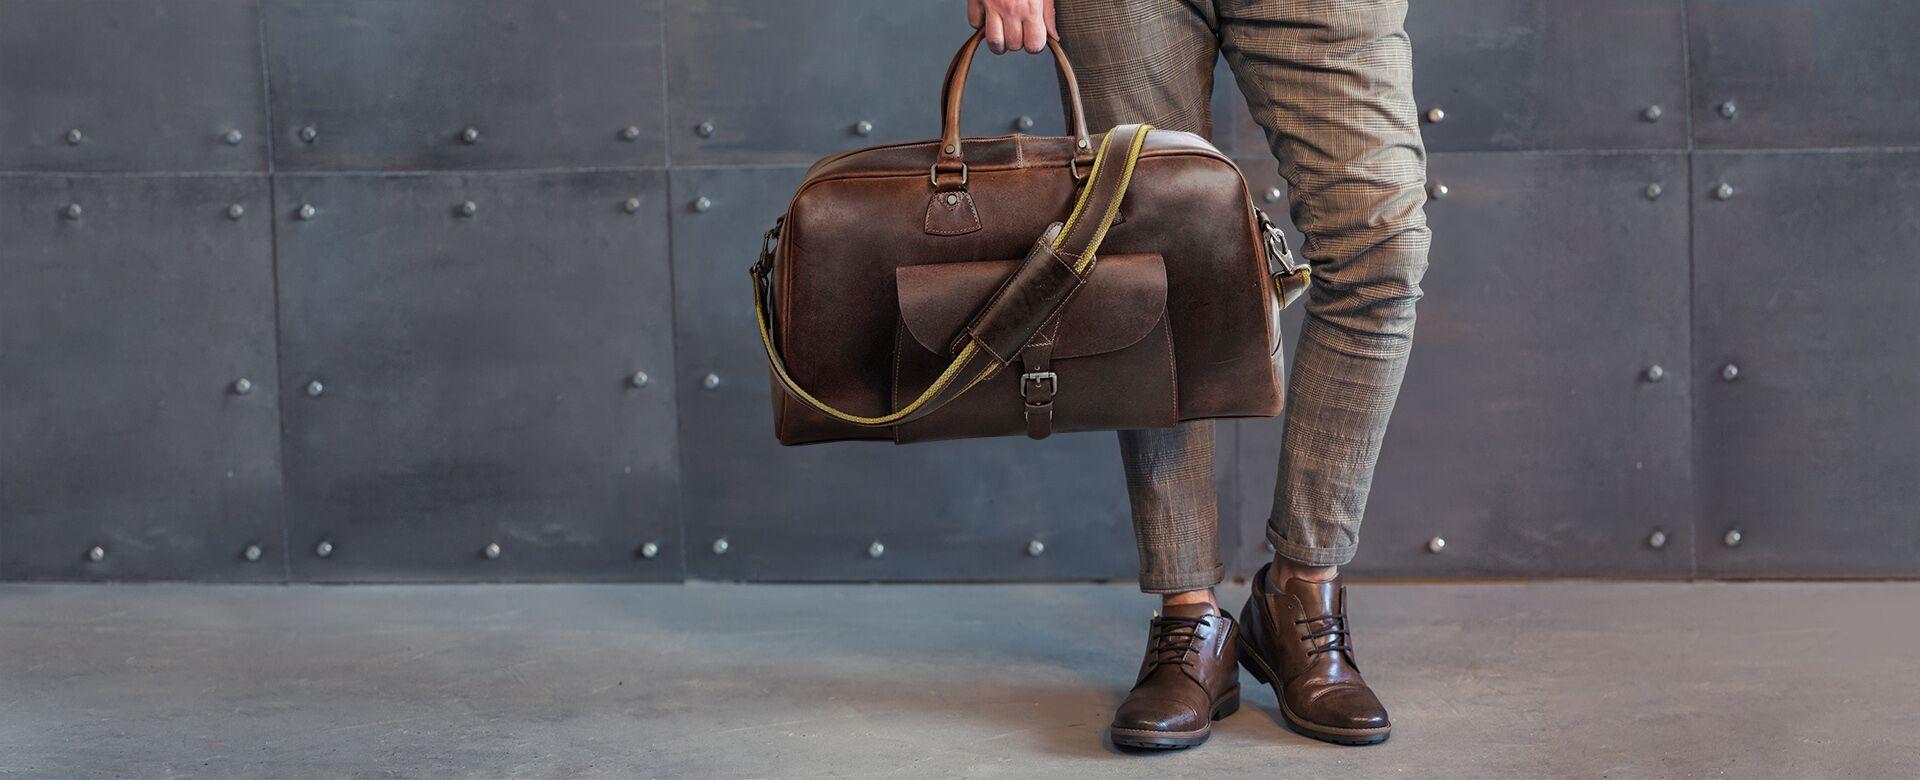 Aaron Leather Goods (@aaronleathergoods) Cover Image